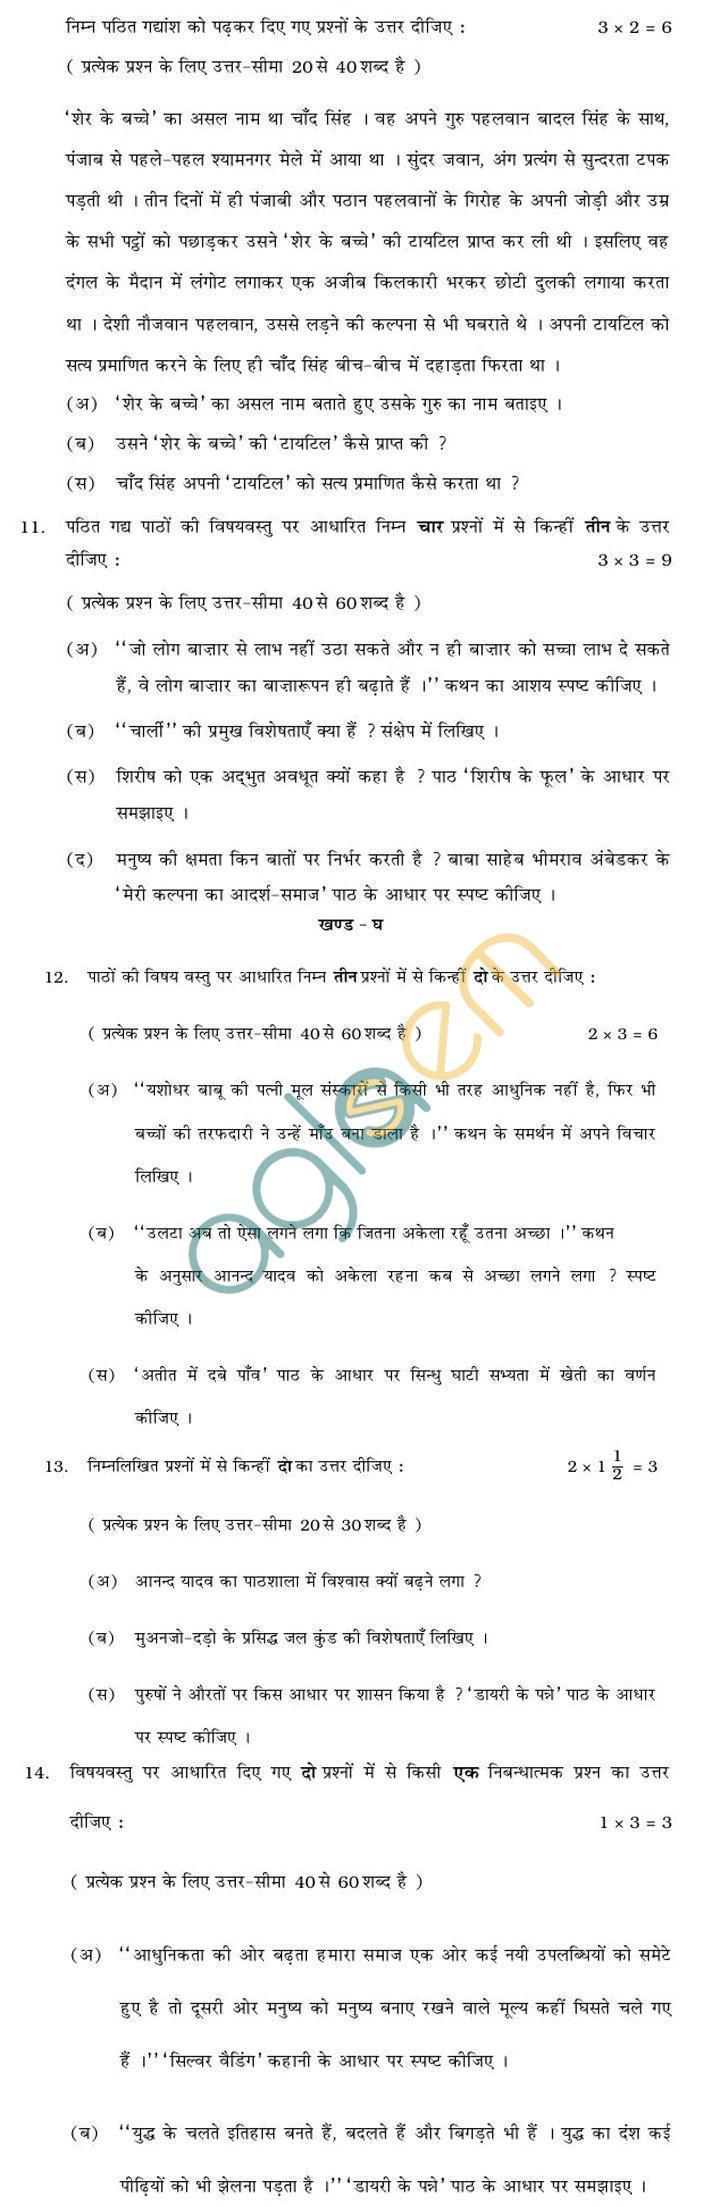 Rajasthan Board Sr. Secondary Hindi (C) Question Paper 2013